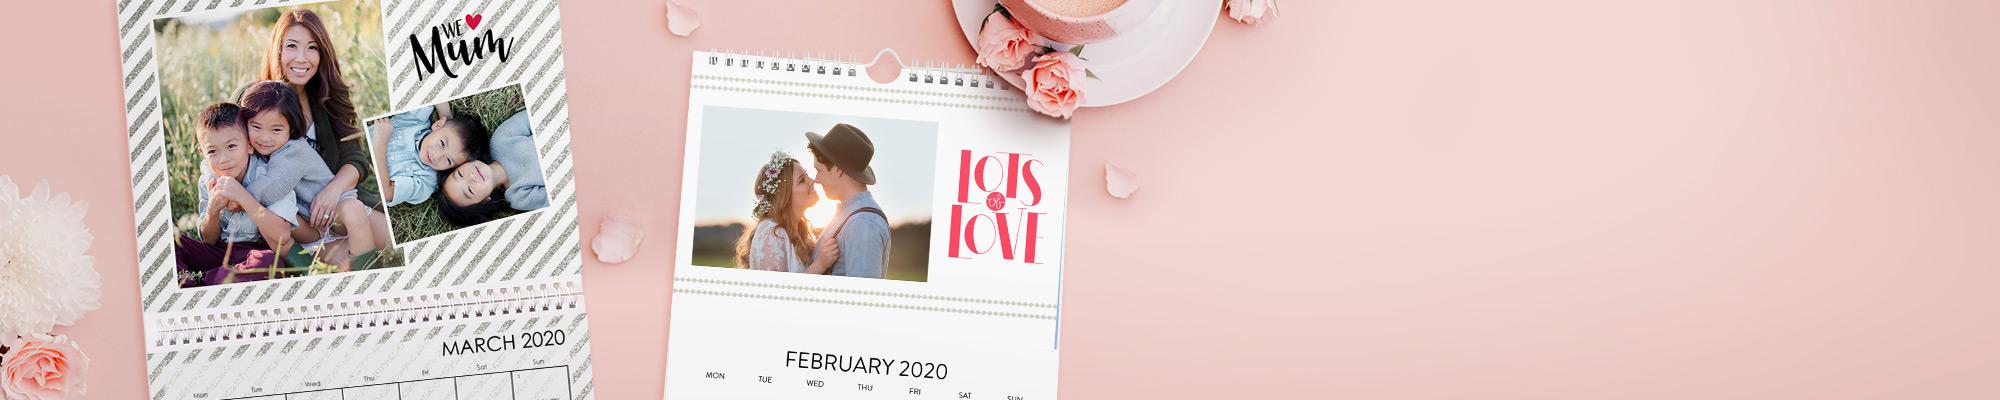 2020 Personalised Calendars